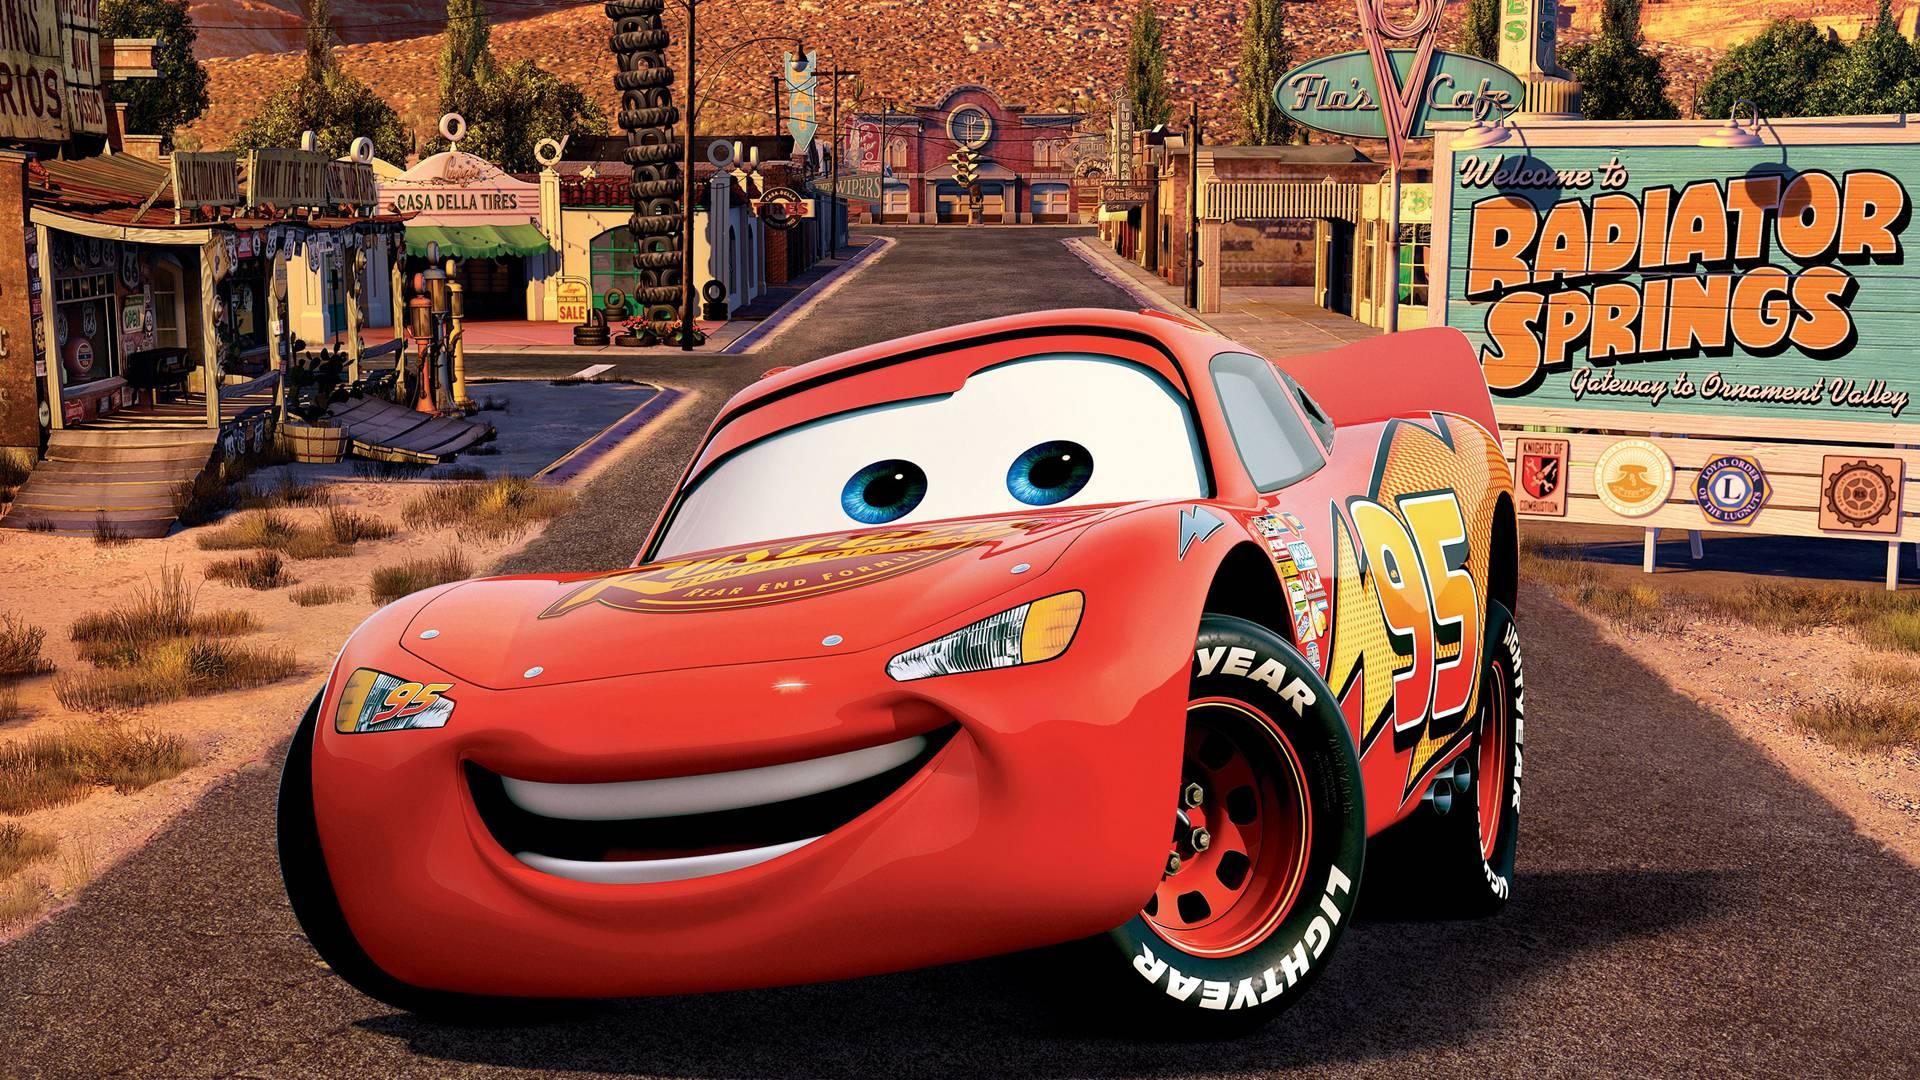 Lovely Radiator Spring Cars Movie Lightning McQueen W #11052 Wallpaper . Great Ideas